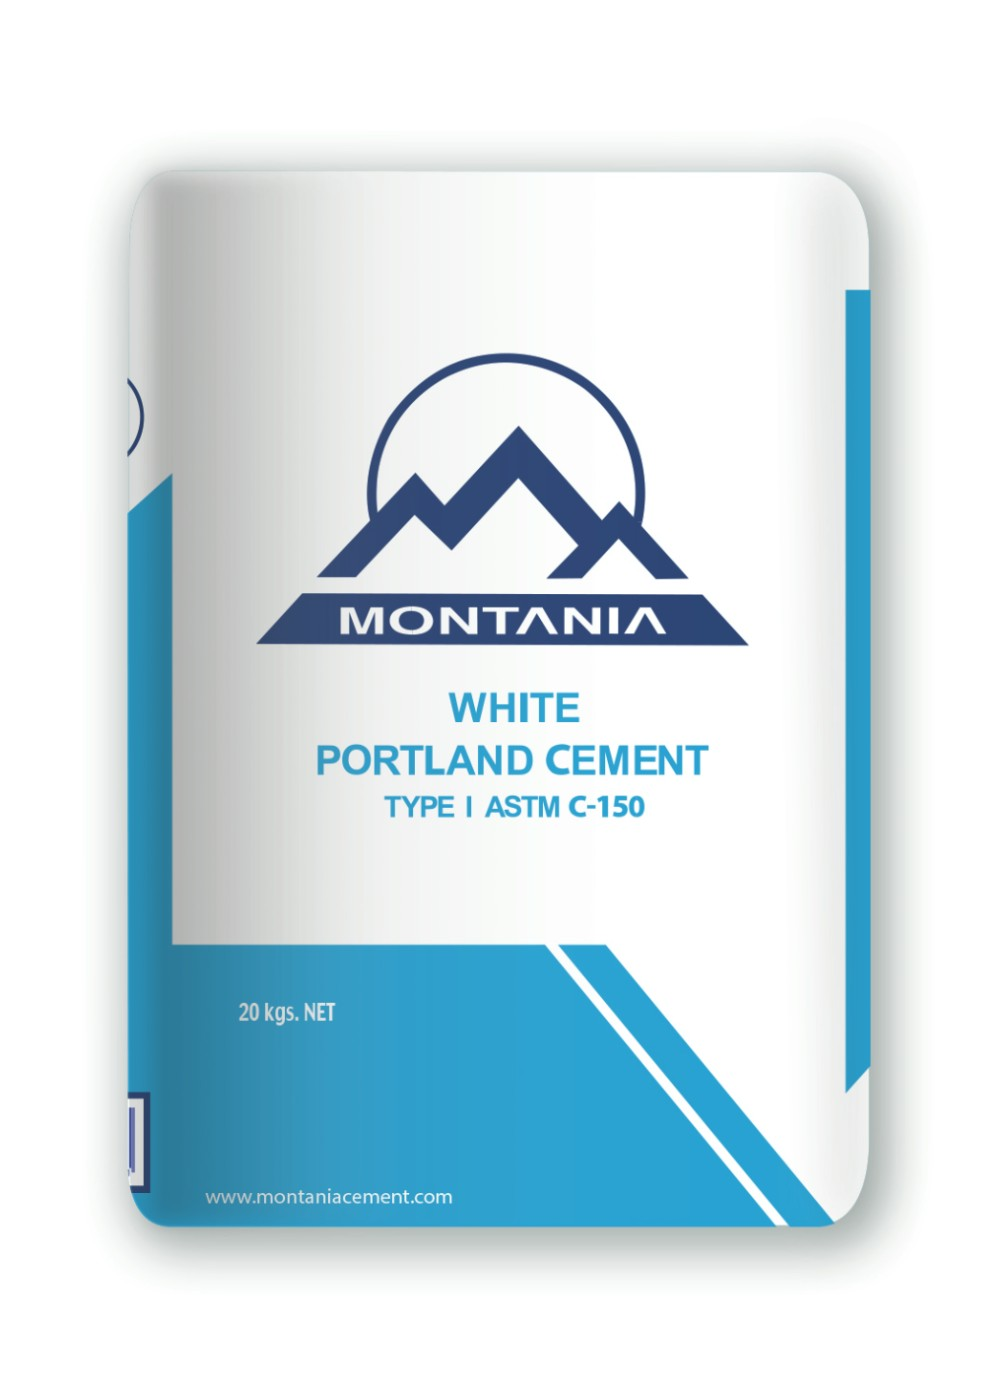 White cement Montania - White Pool Plastering - SCG Cement Manufacturer